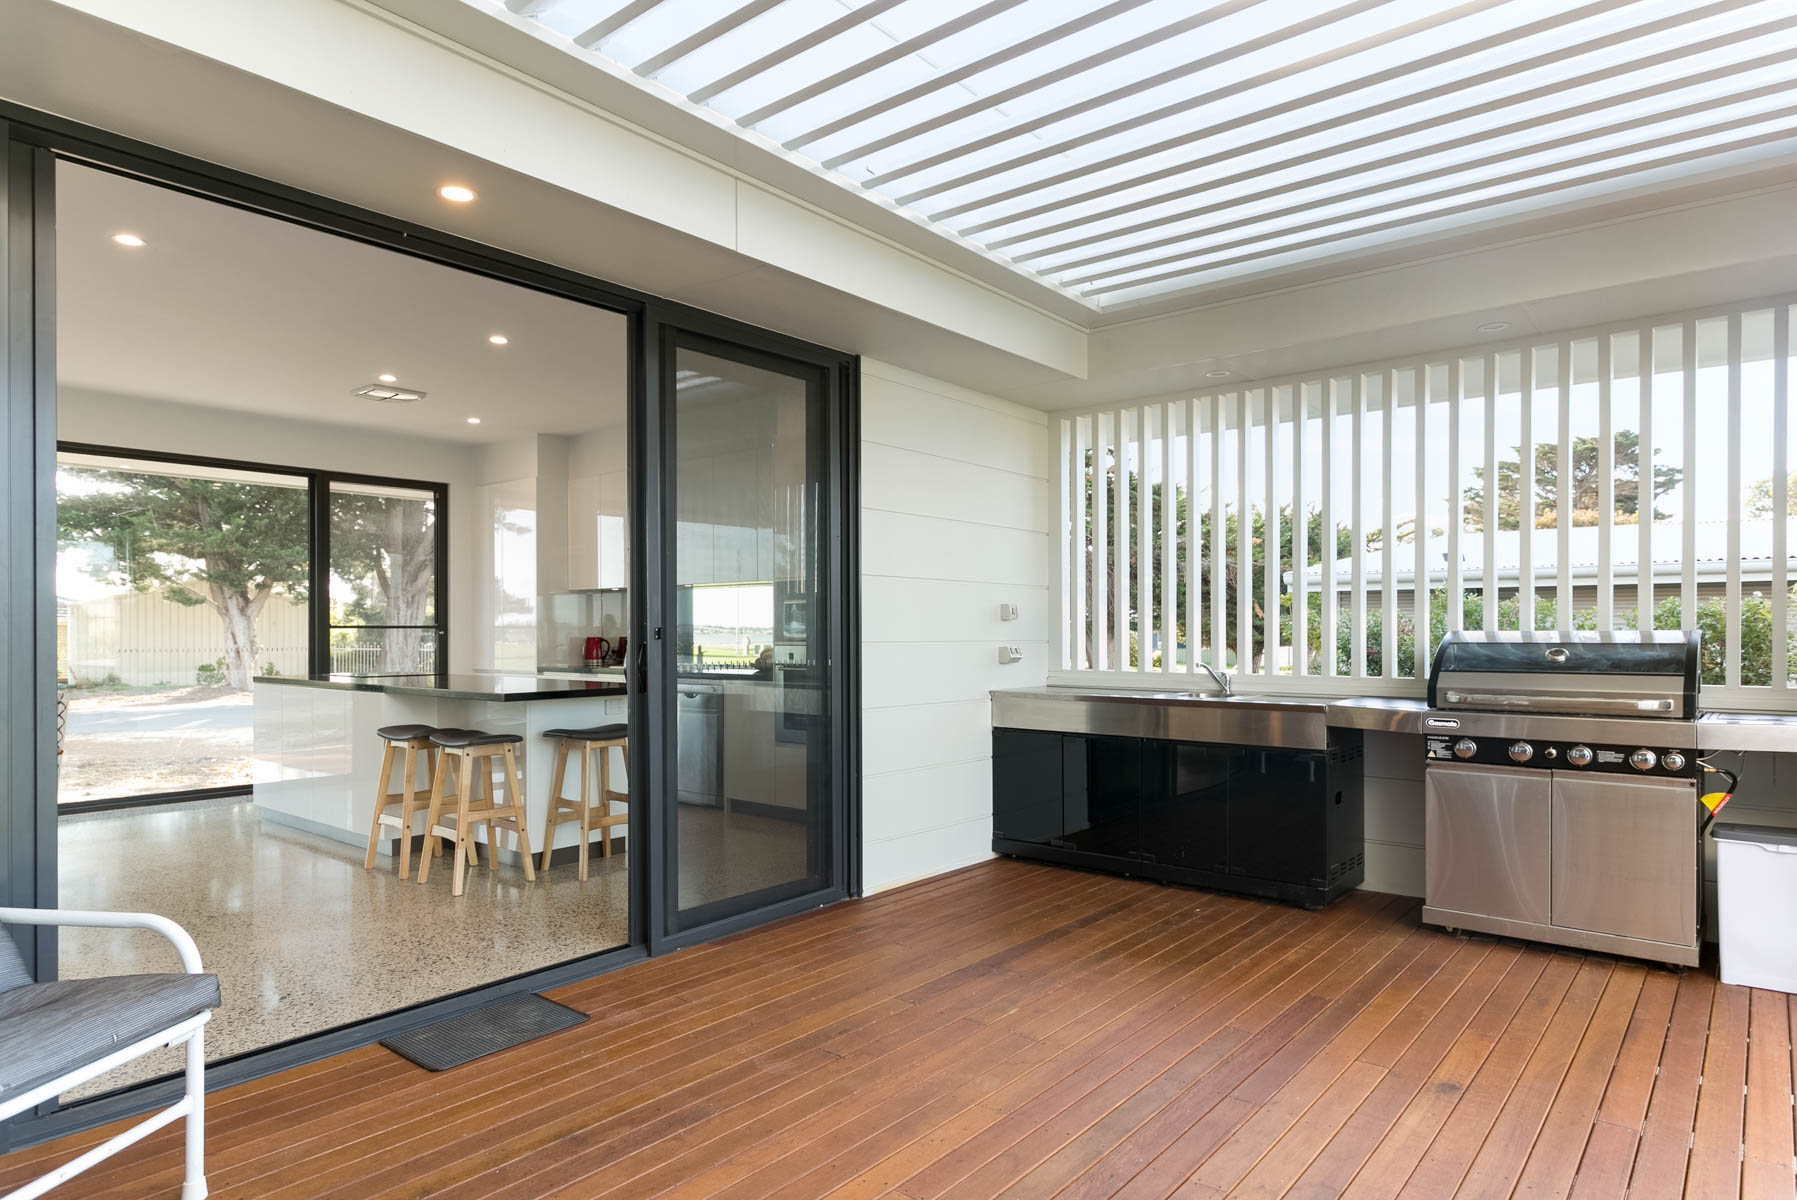 New Home, Custom Home, Family Home, Design, Builders, Award Winning, Single Storey, Goolwa, Fleurieu, Outdoor living, Decking